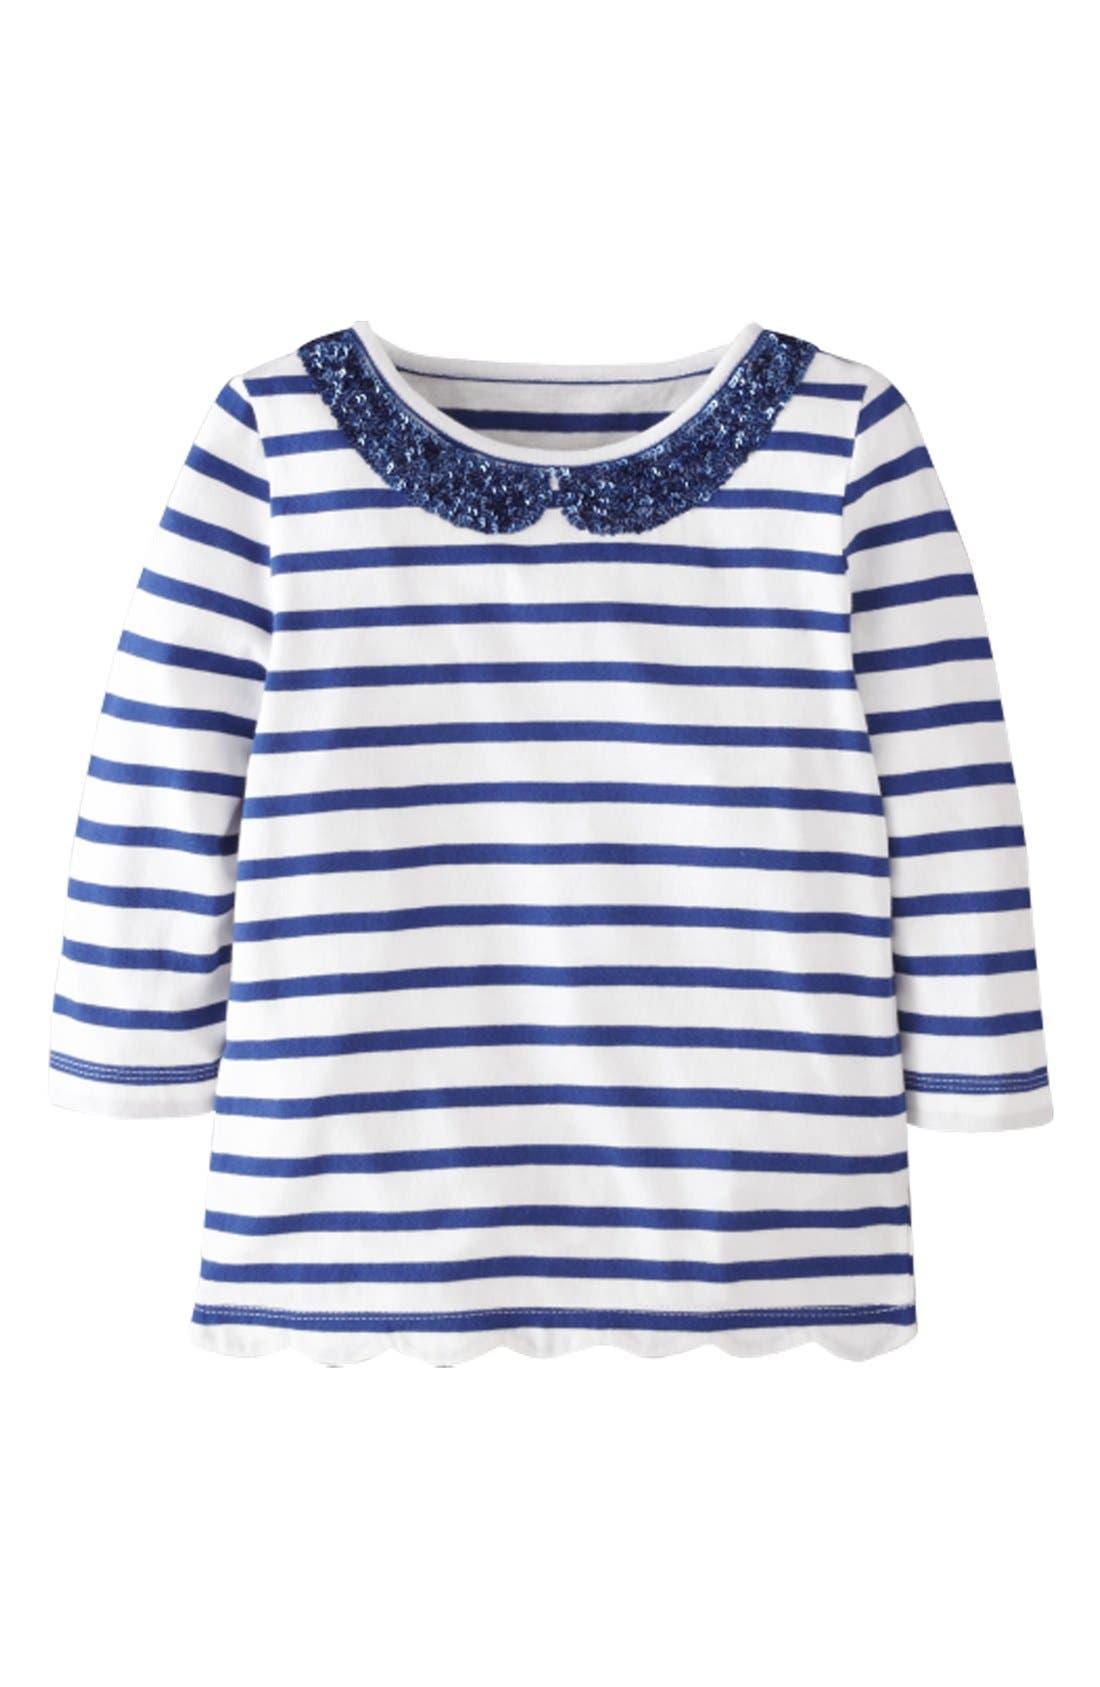 Alternate Image 1 Selected - Mini Boden 'Sequin Collar' Tee (Little Girls & Big Girls)